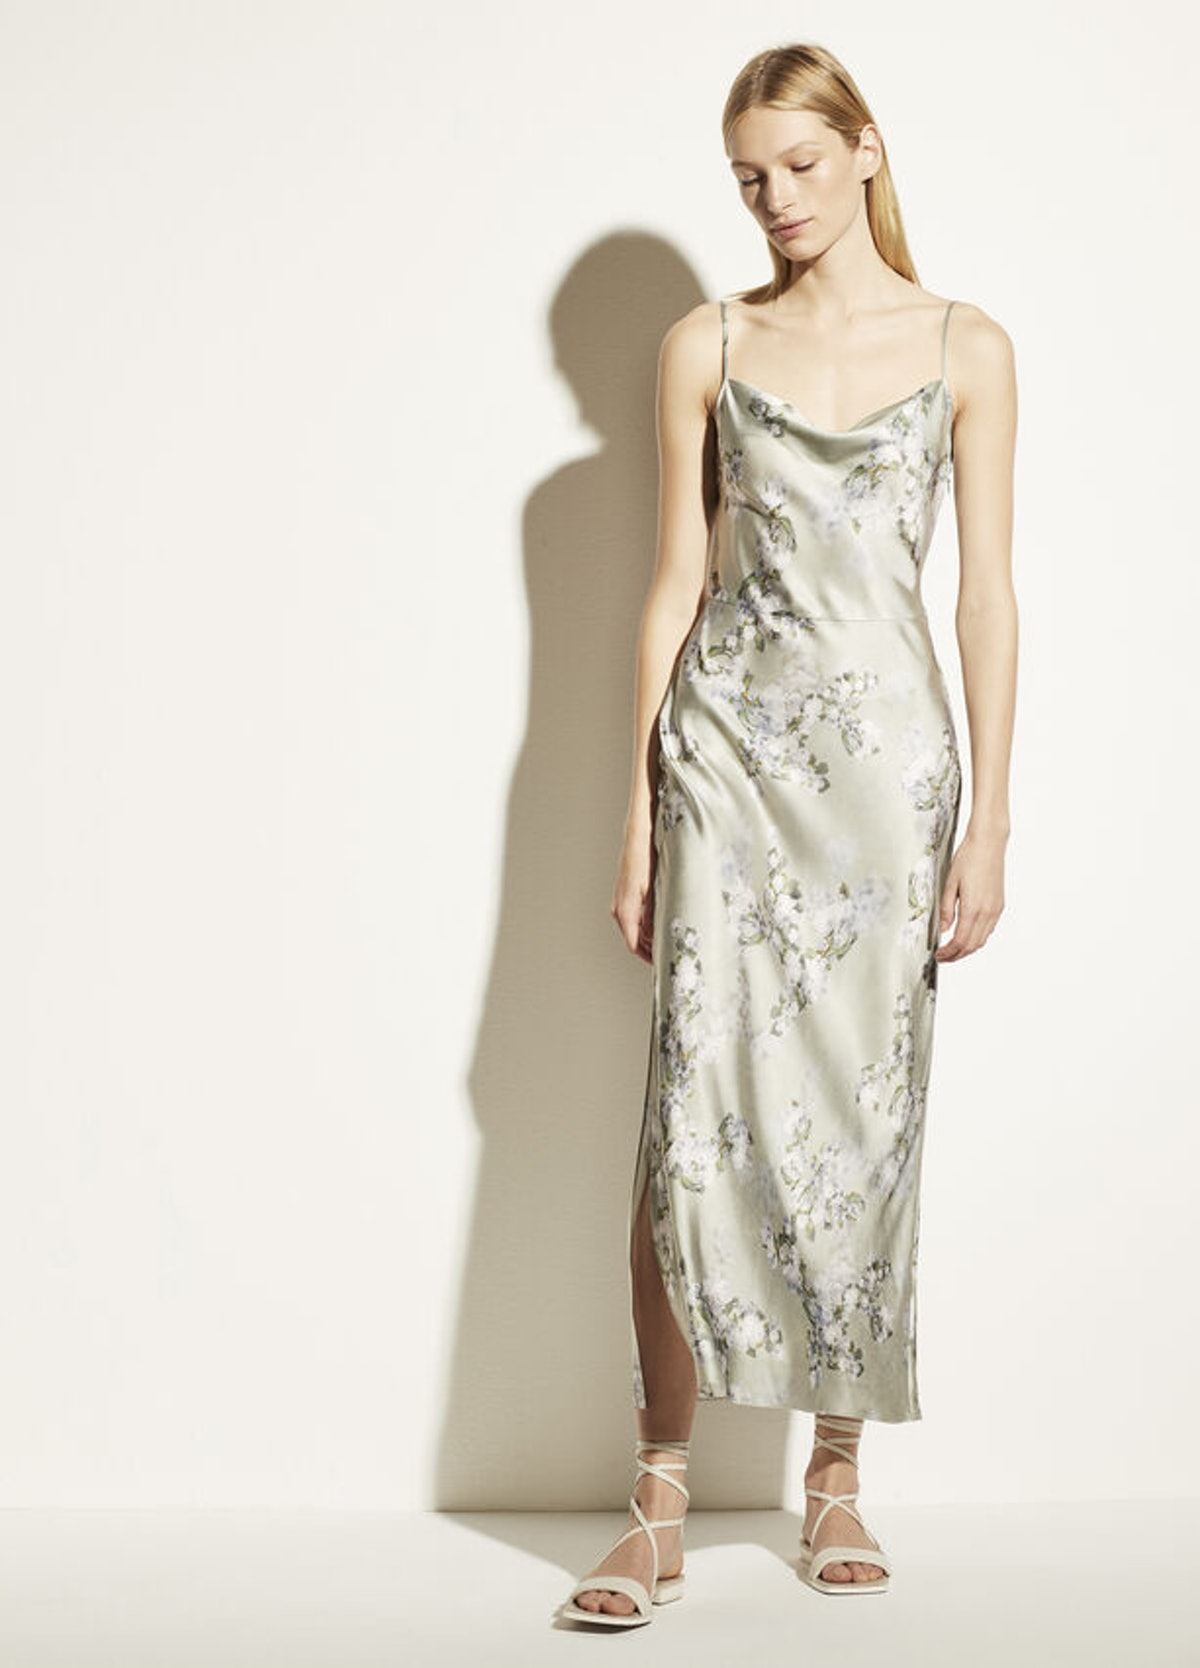 Hazy Blossom Cowl Neck Slip Dress